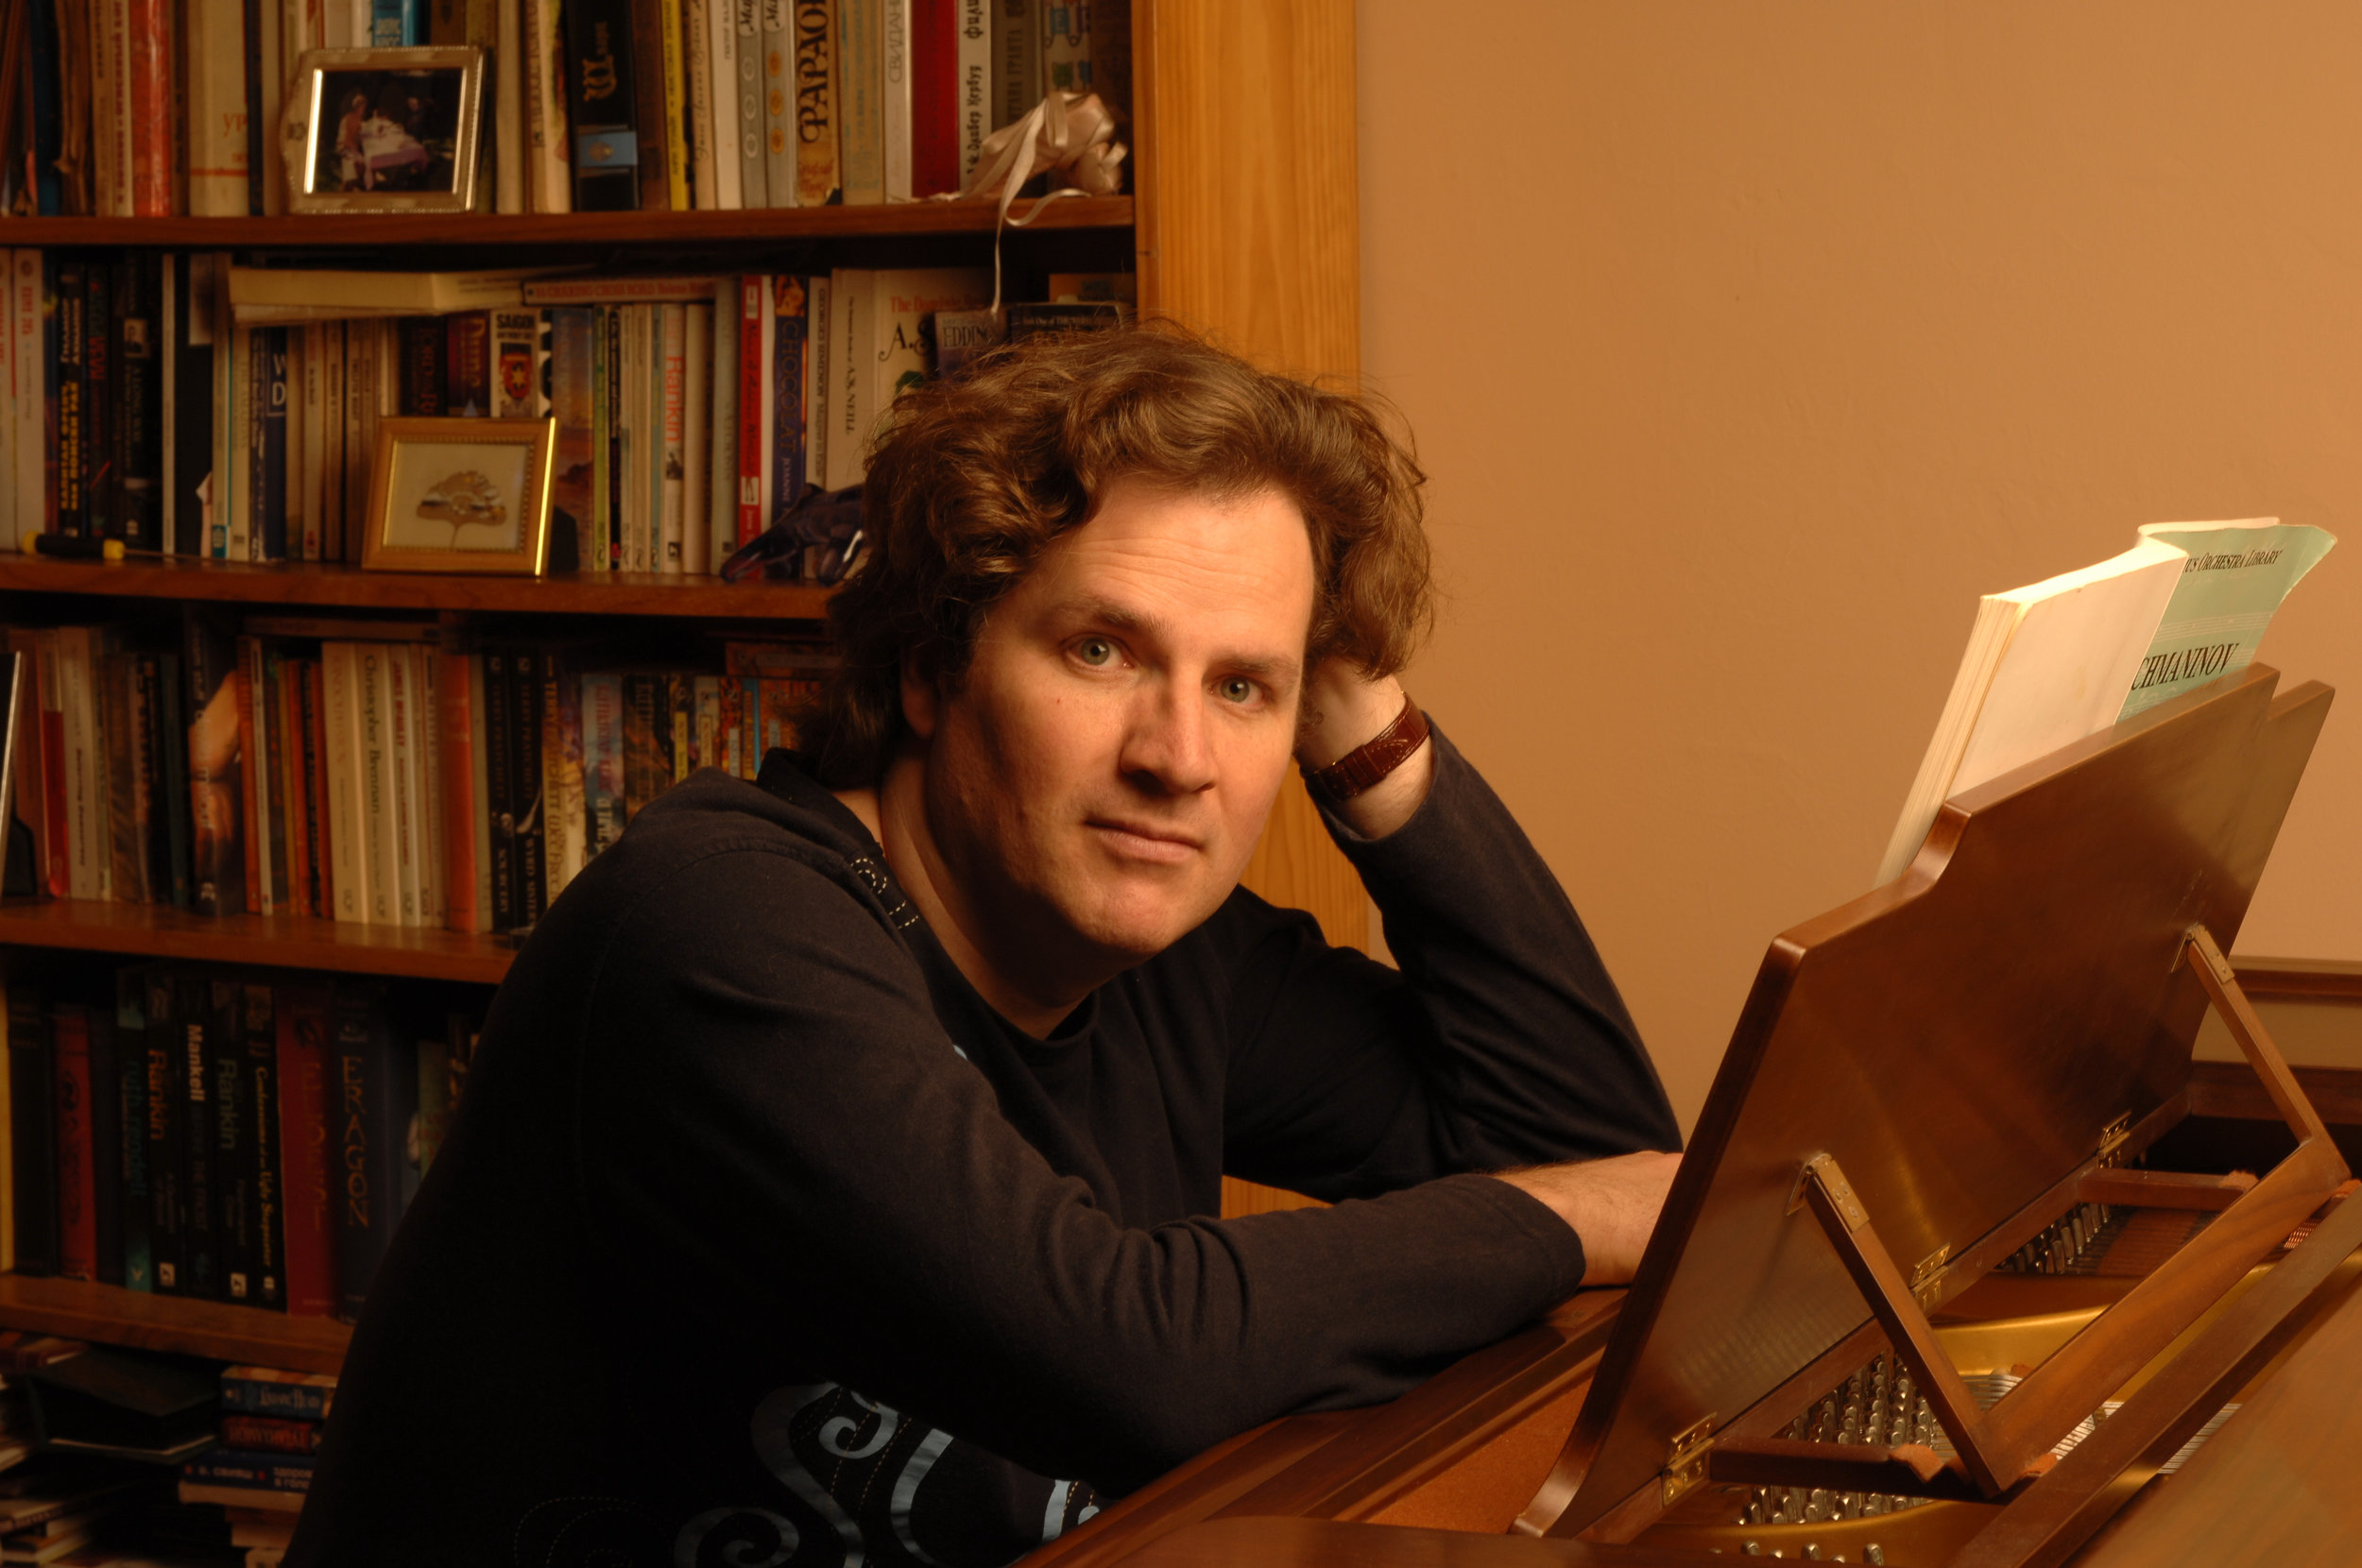 TOM WOODS at piano 3 (239).jpg